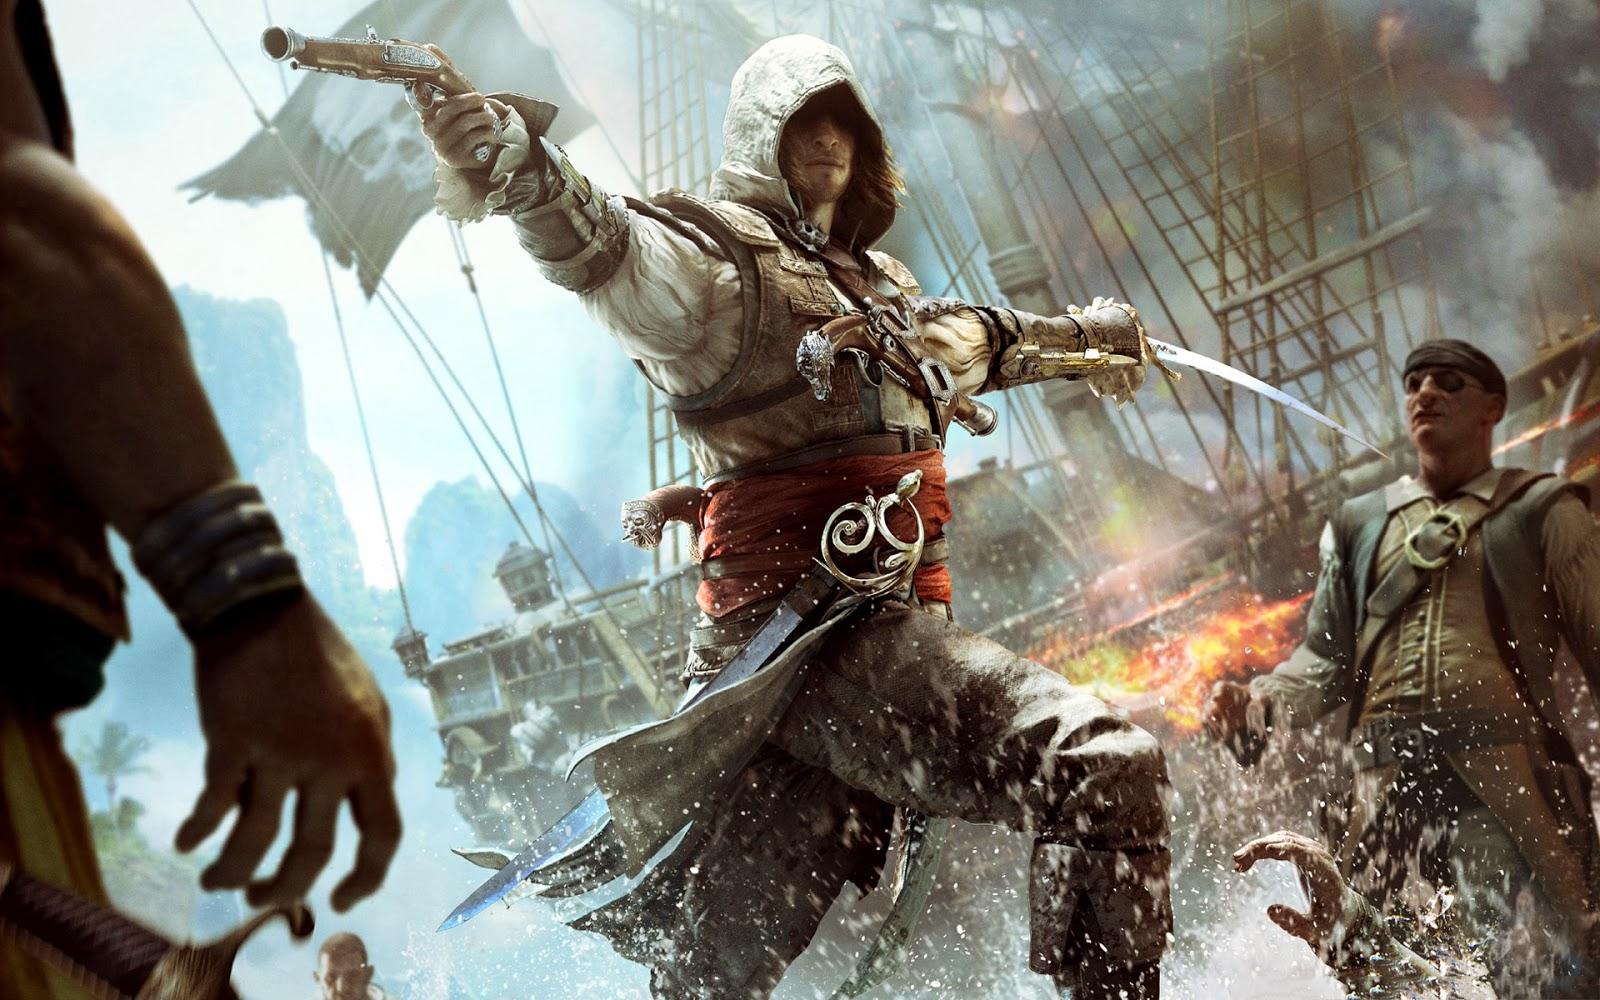 Assassin S Creed Iv Black Flag Makes Its Way To Playstation 4